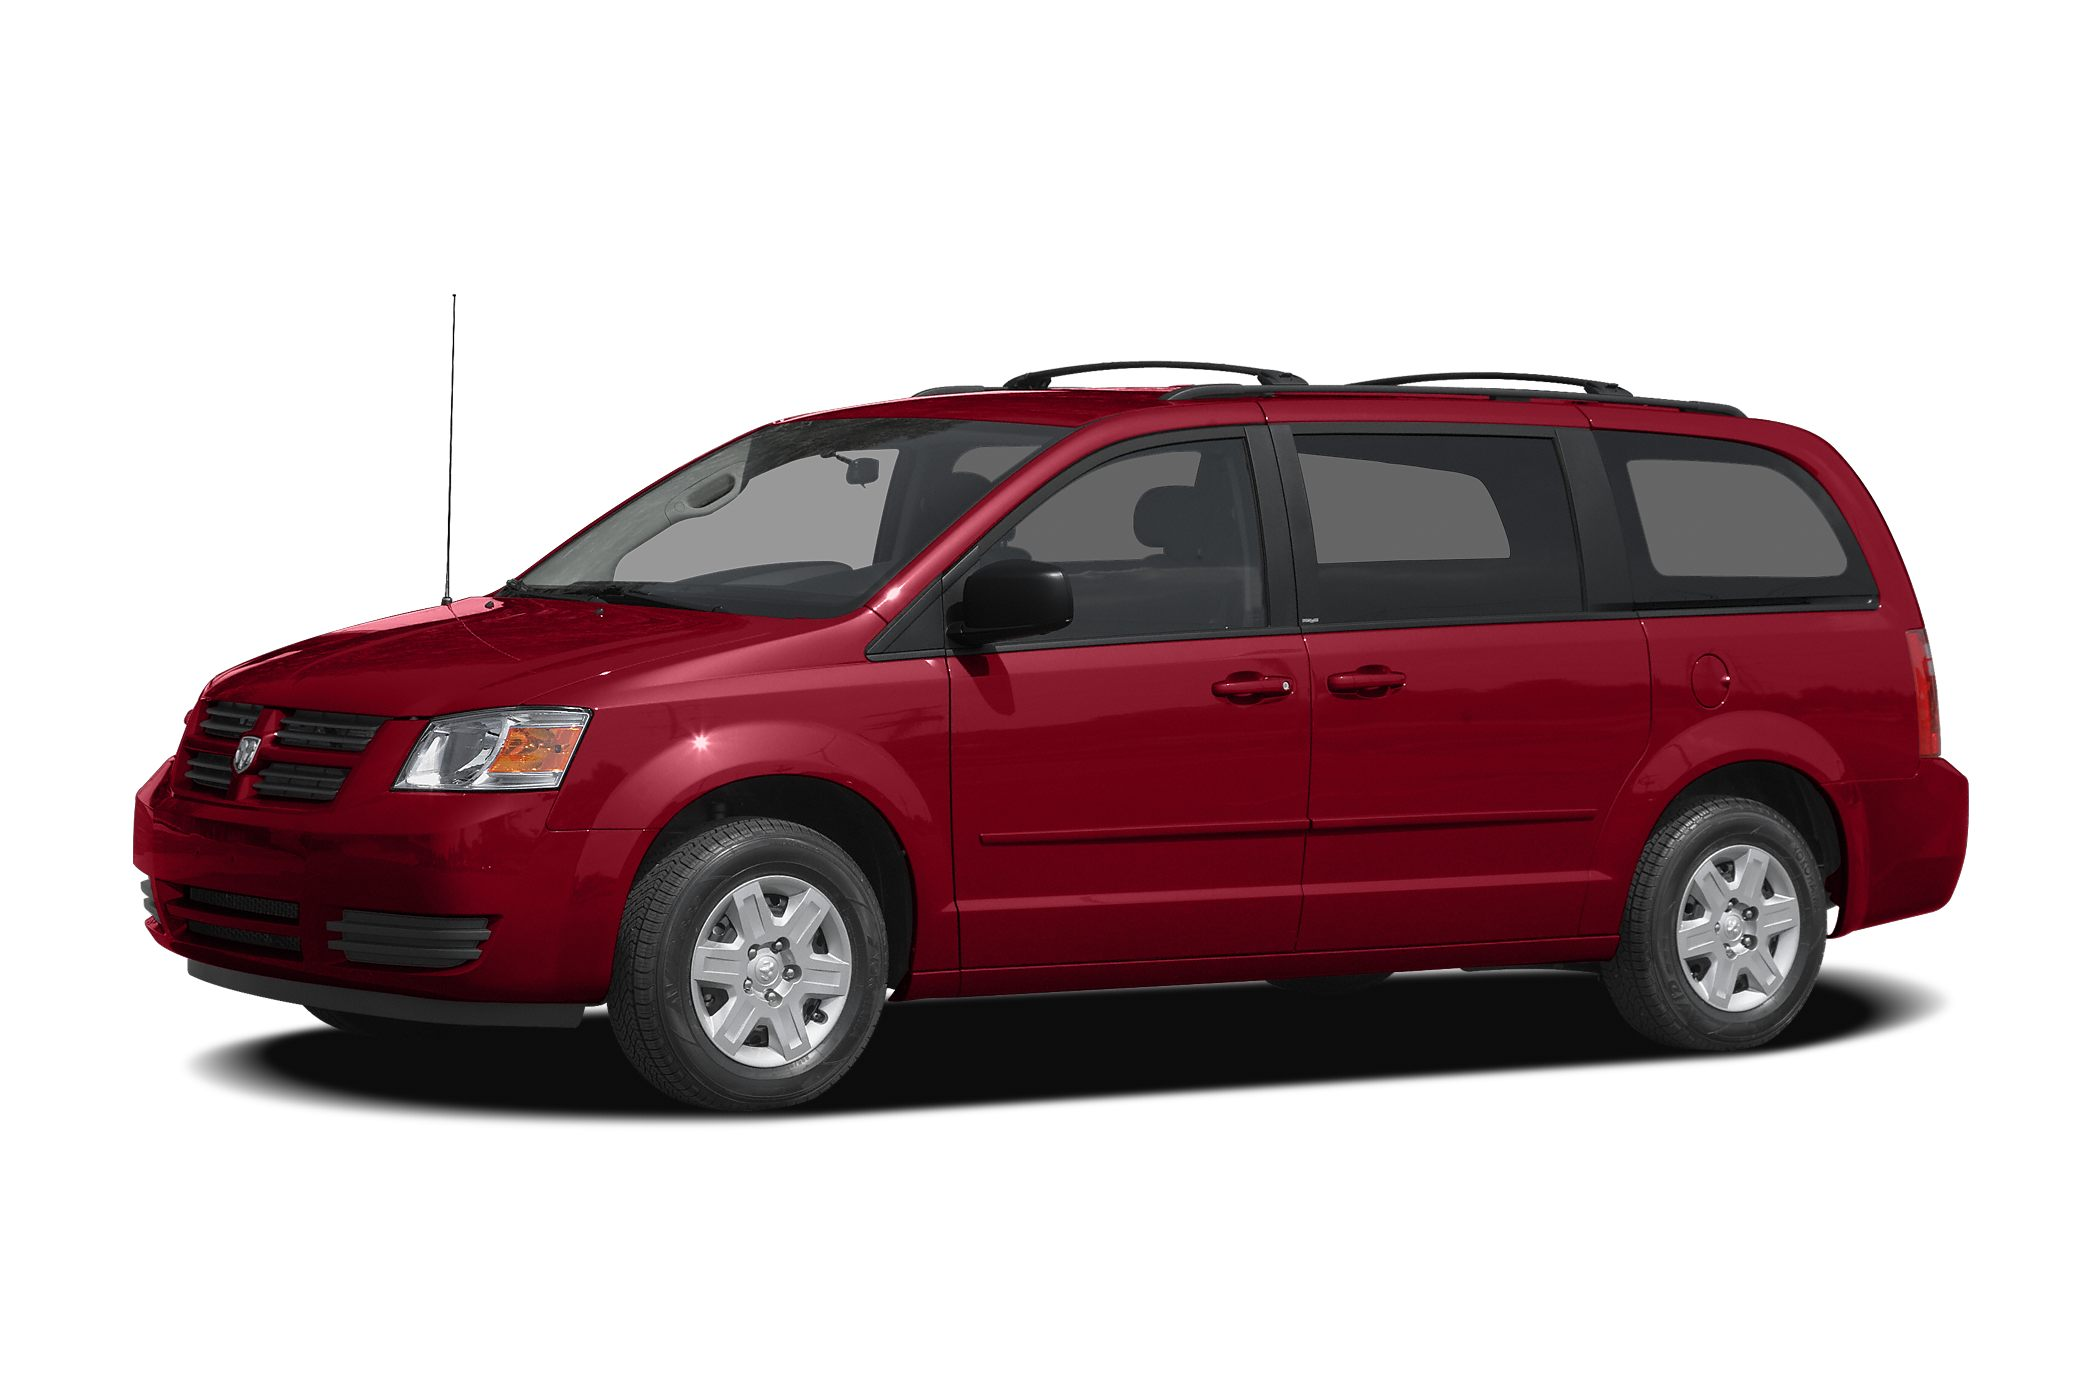 2008 Dodge Grand Caravan CV Minivan for sale in Charlotte for $4,995 with 181,415 miles.